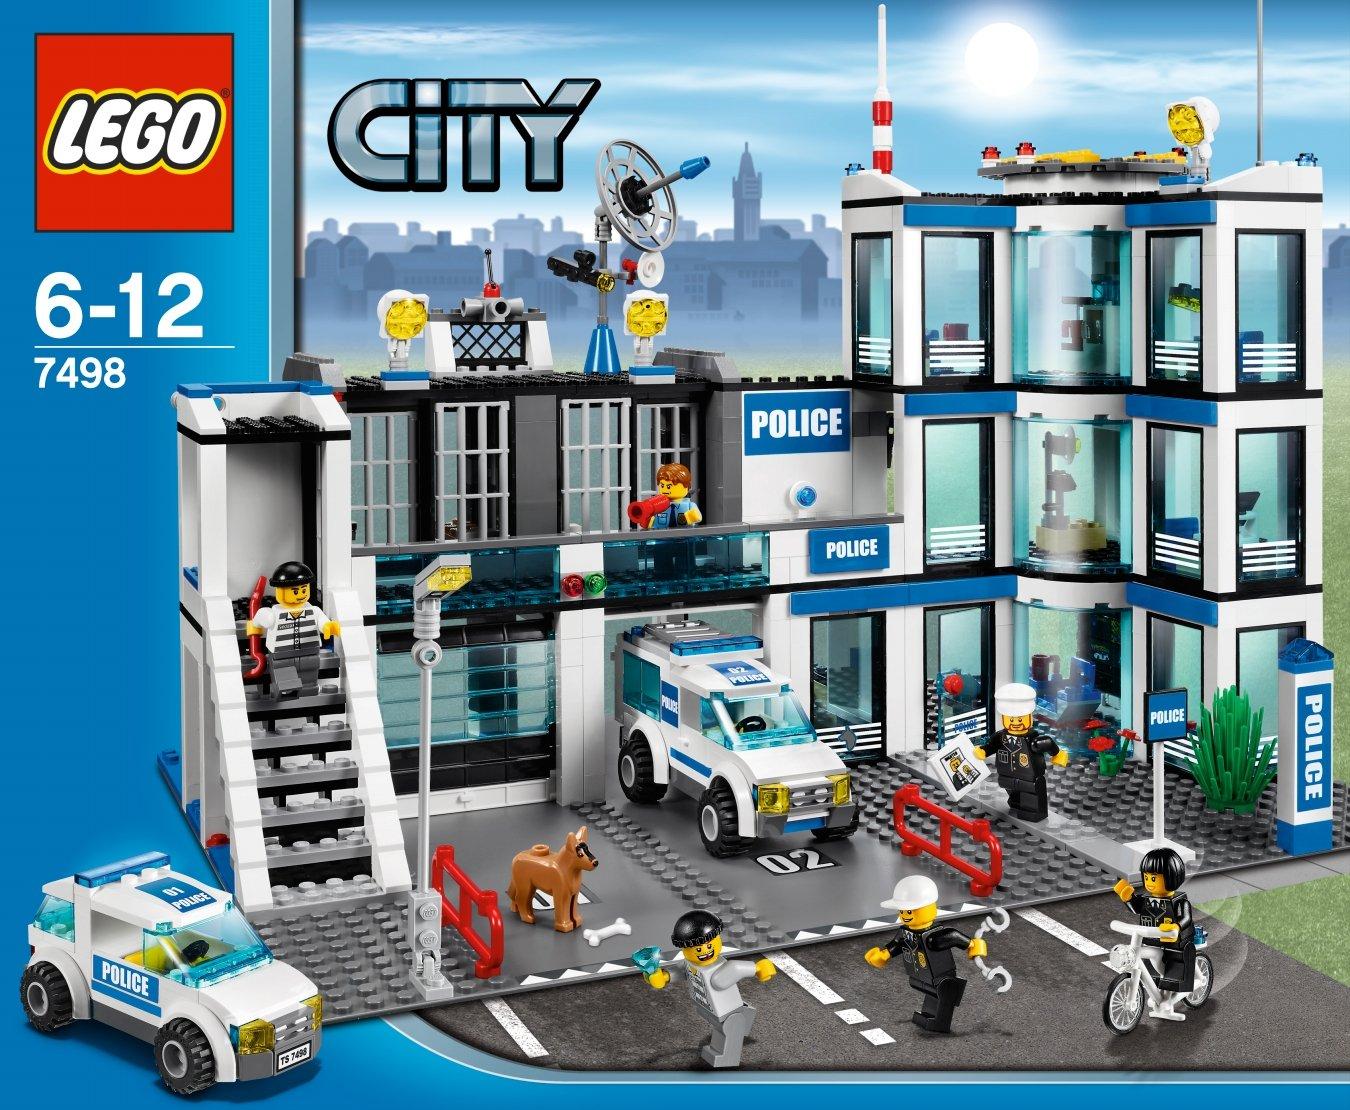 Lego City 7498 Police Station Lego City Amazon Toys Games